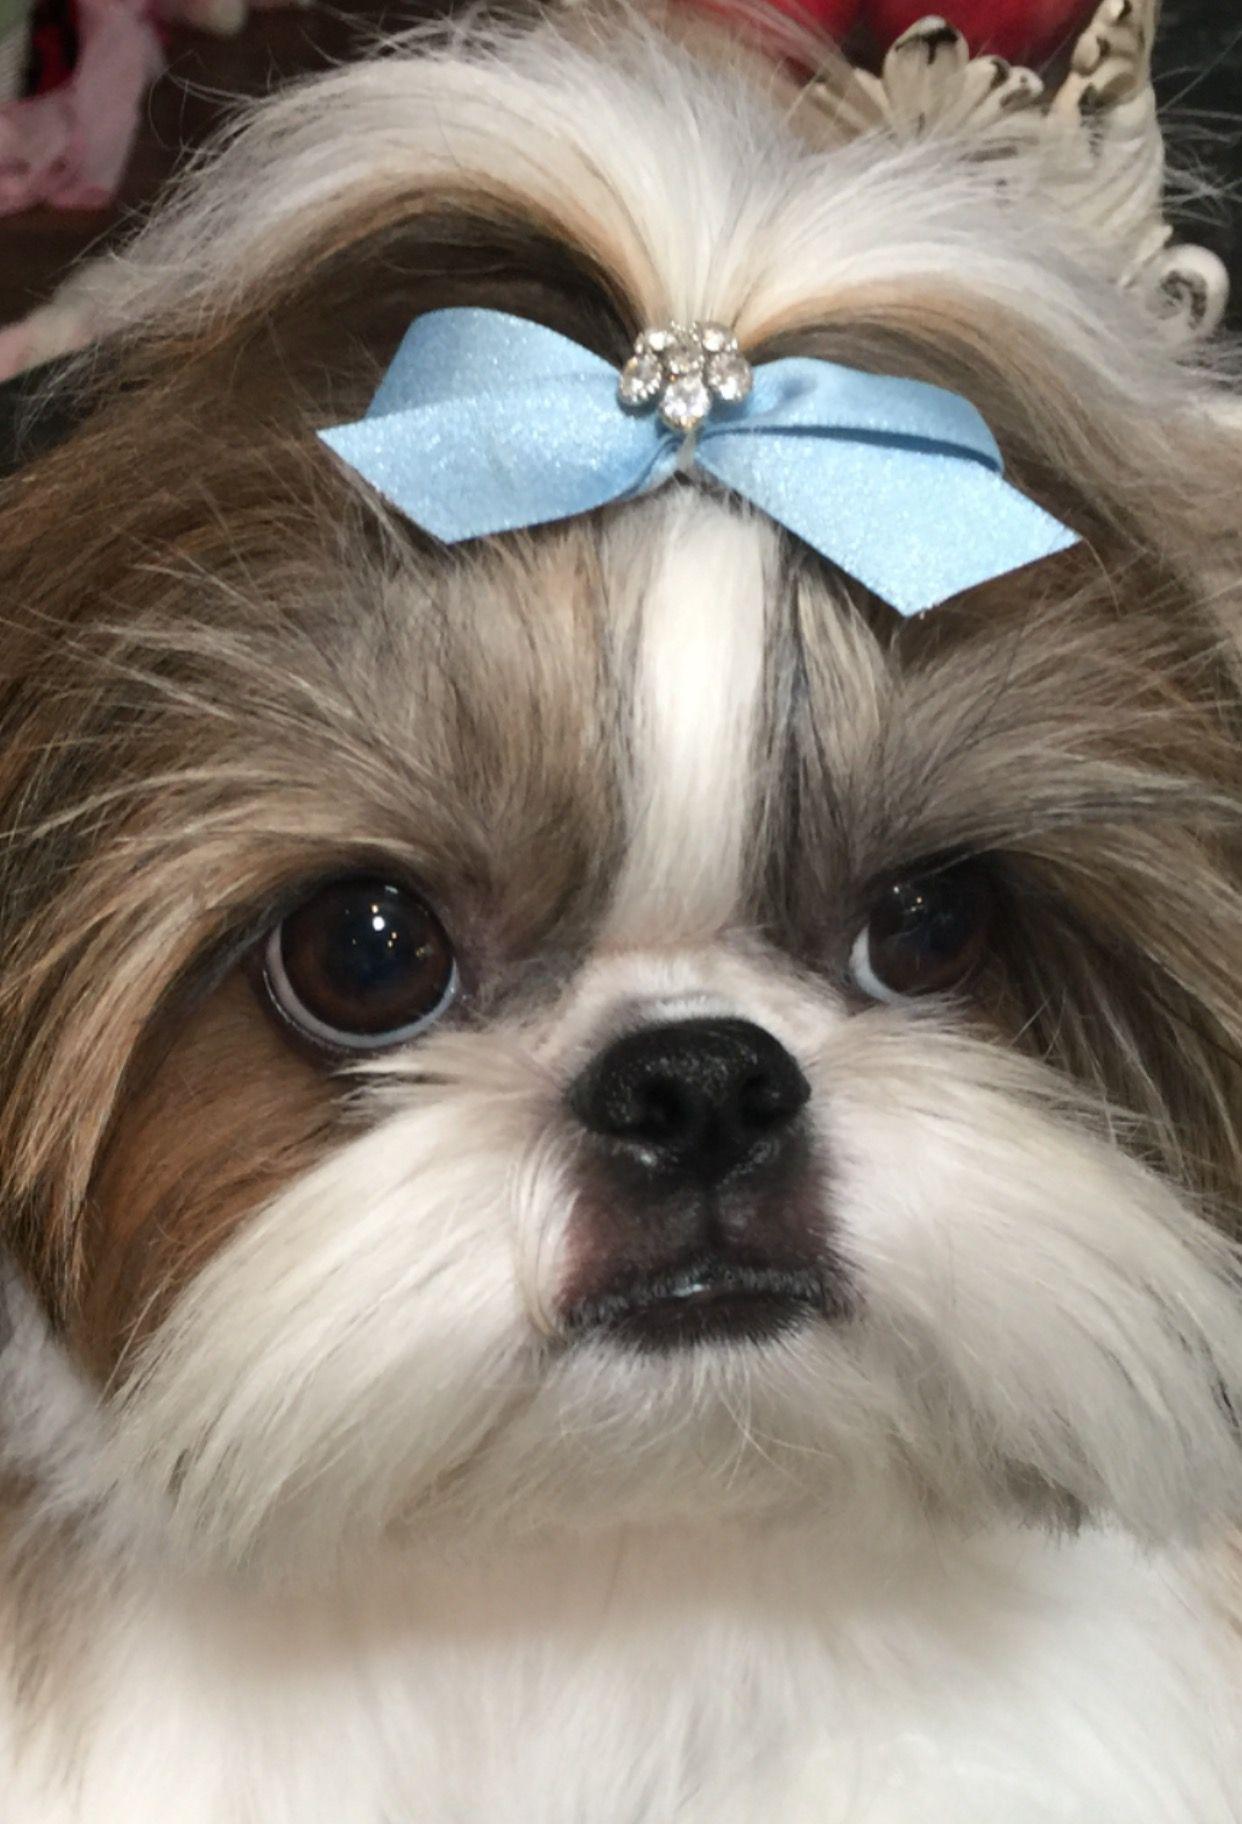 My Sweet Girl With Images Shih Tzu Puppy Shih Tzu Shih Tzus